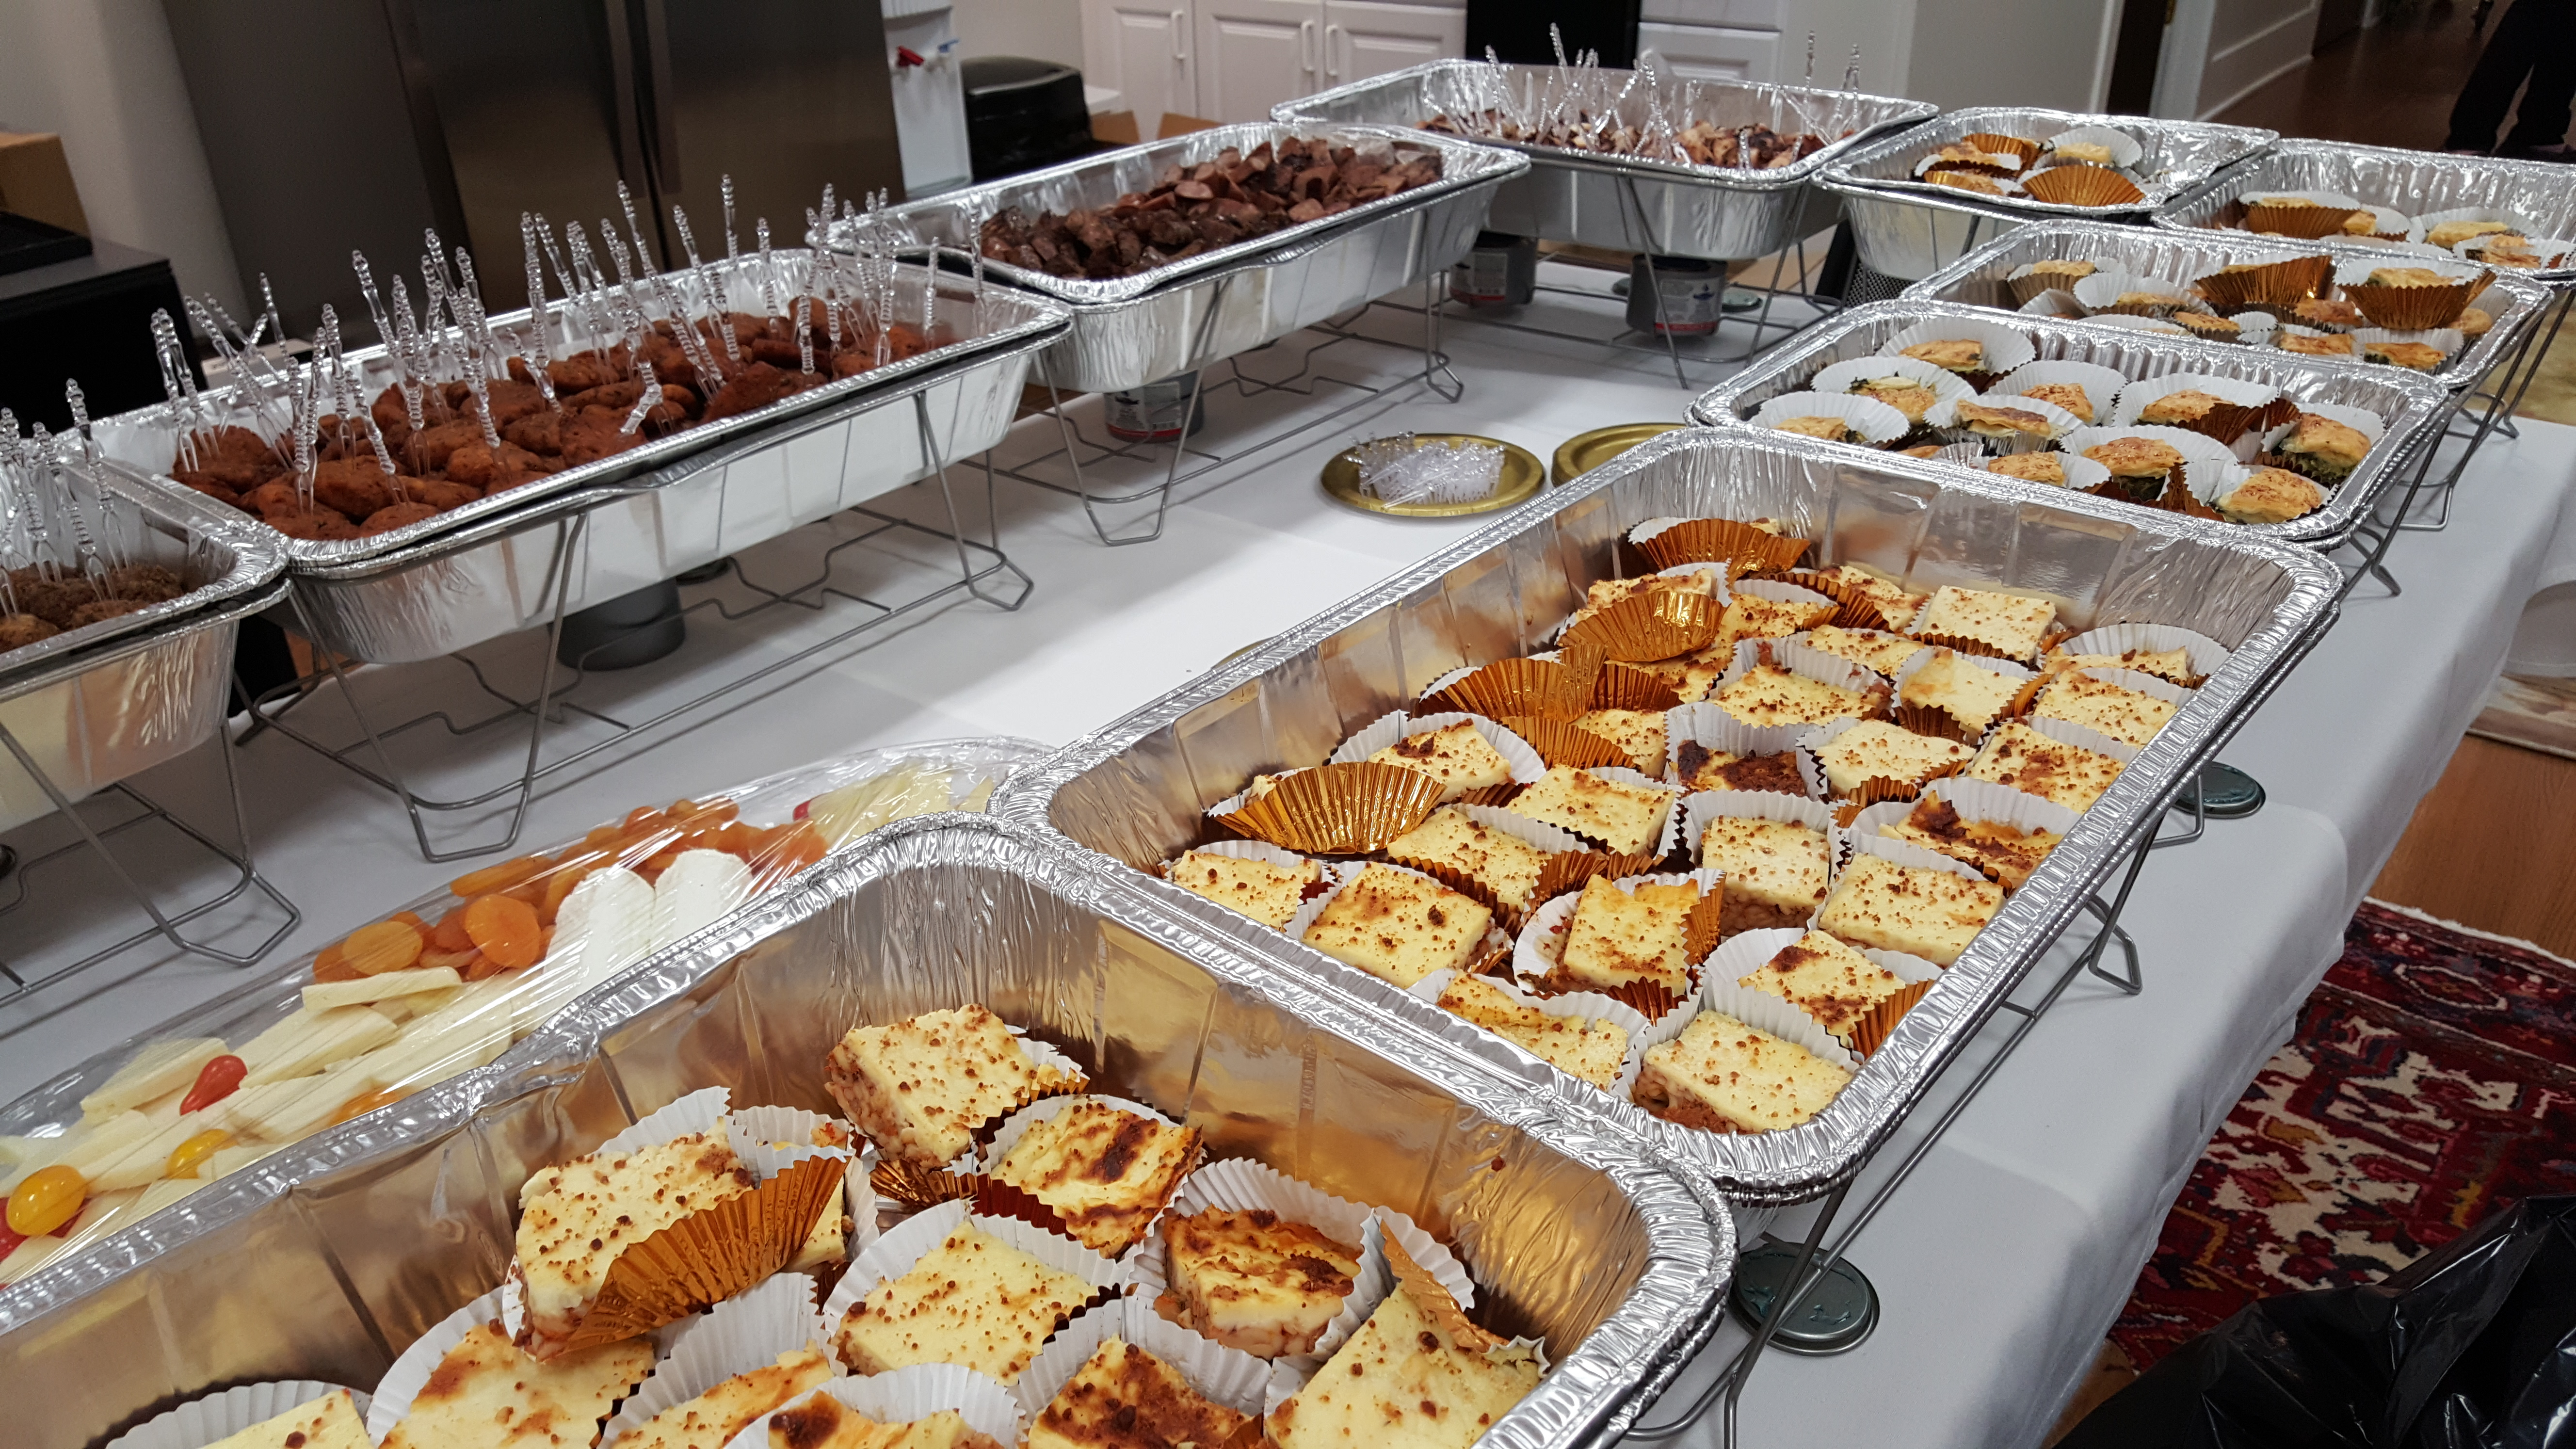 Catering by Anemos Greek Cuisine. Manalapan NJ.